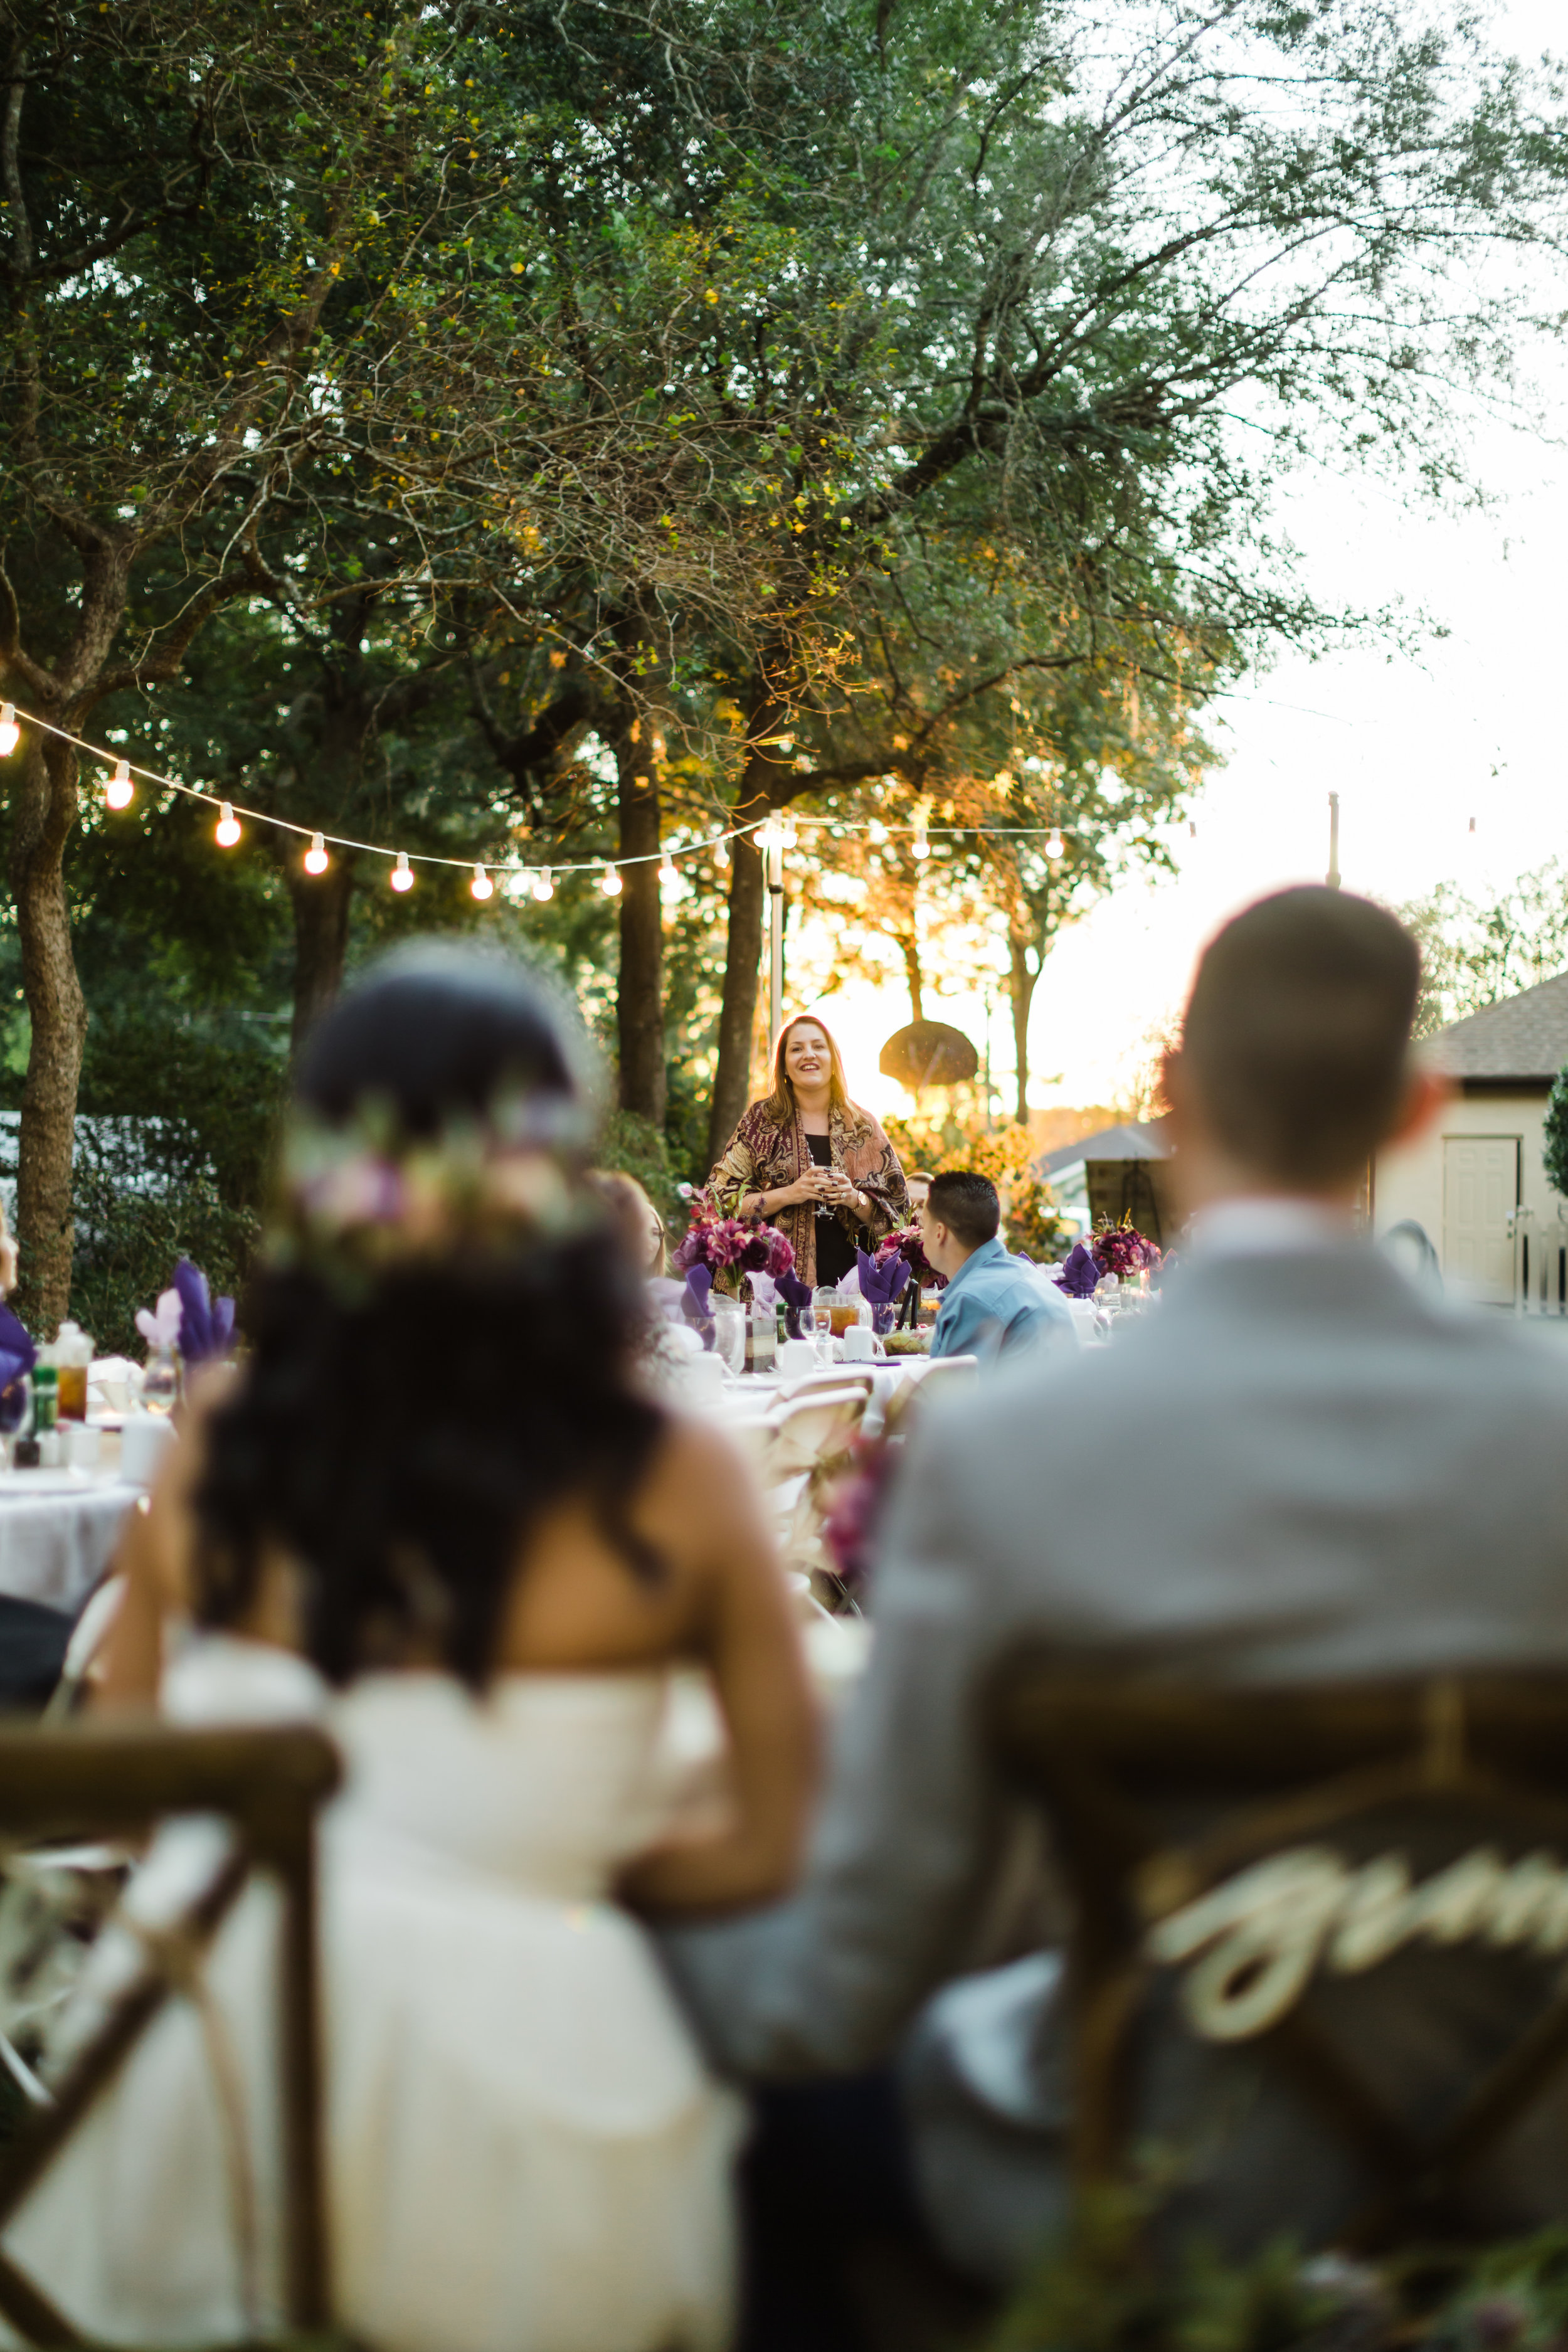 2018.11.03 Jael and Edel Ocala Wedding FINALS (358 of 441).jpg